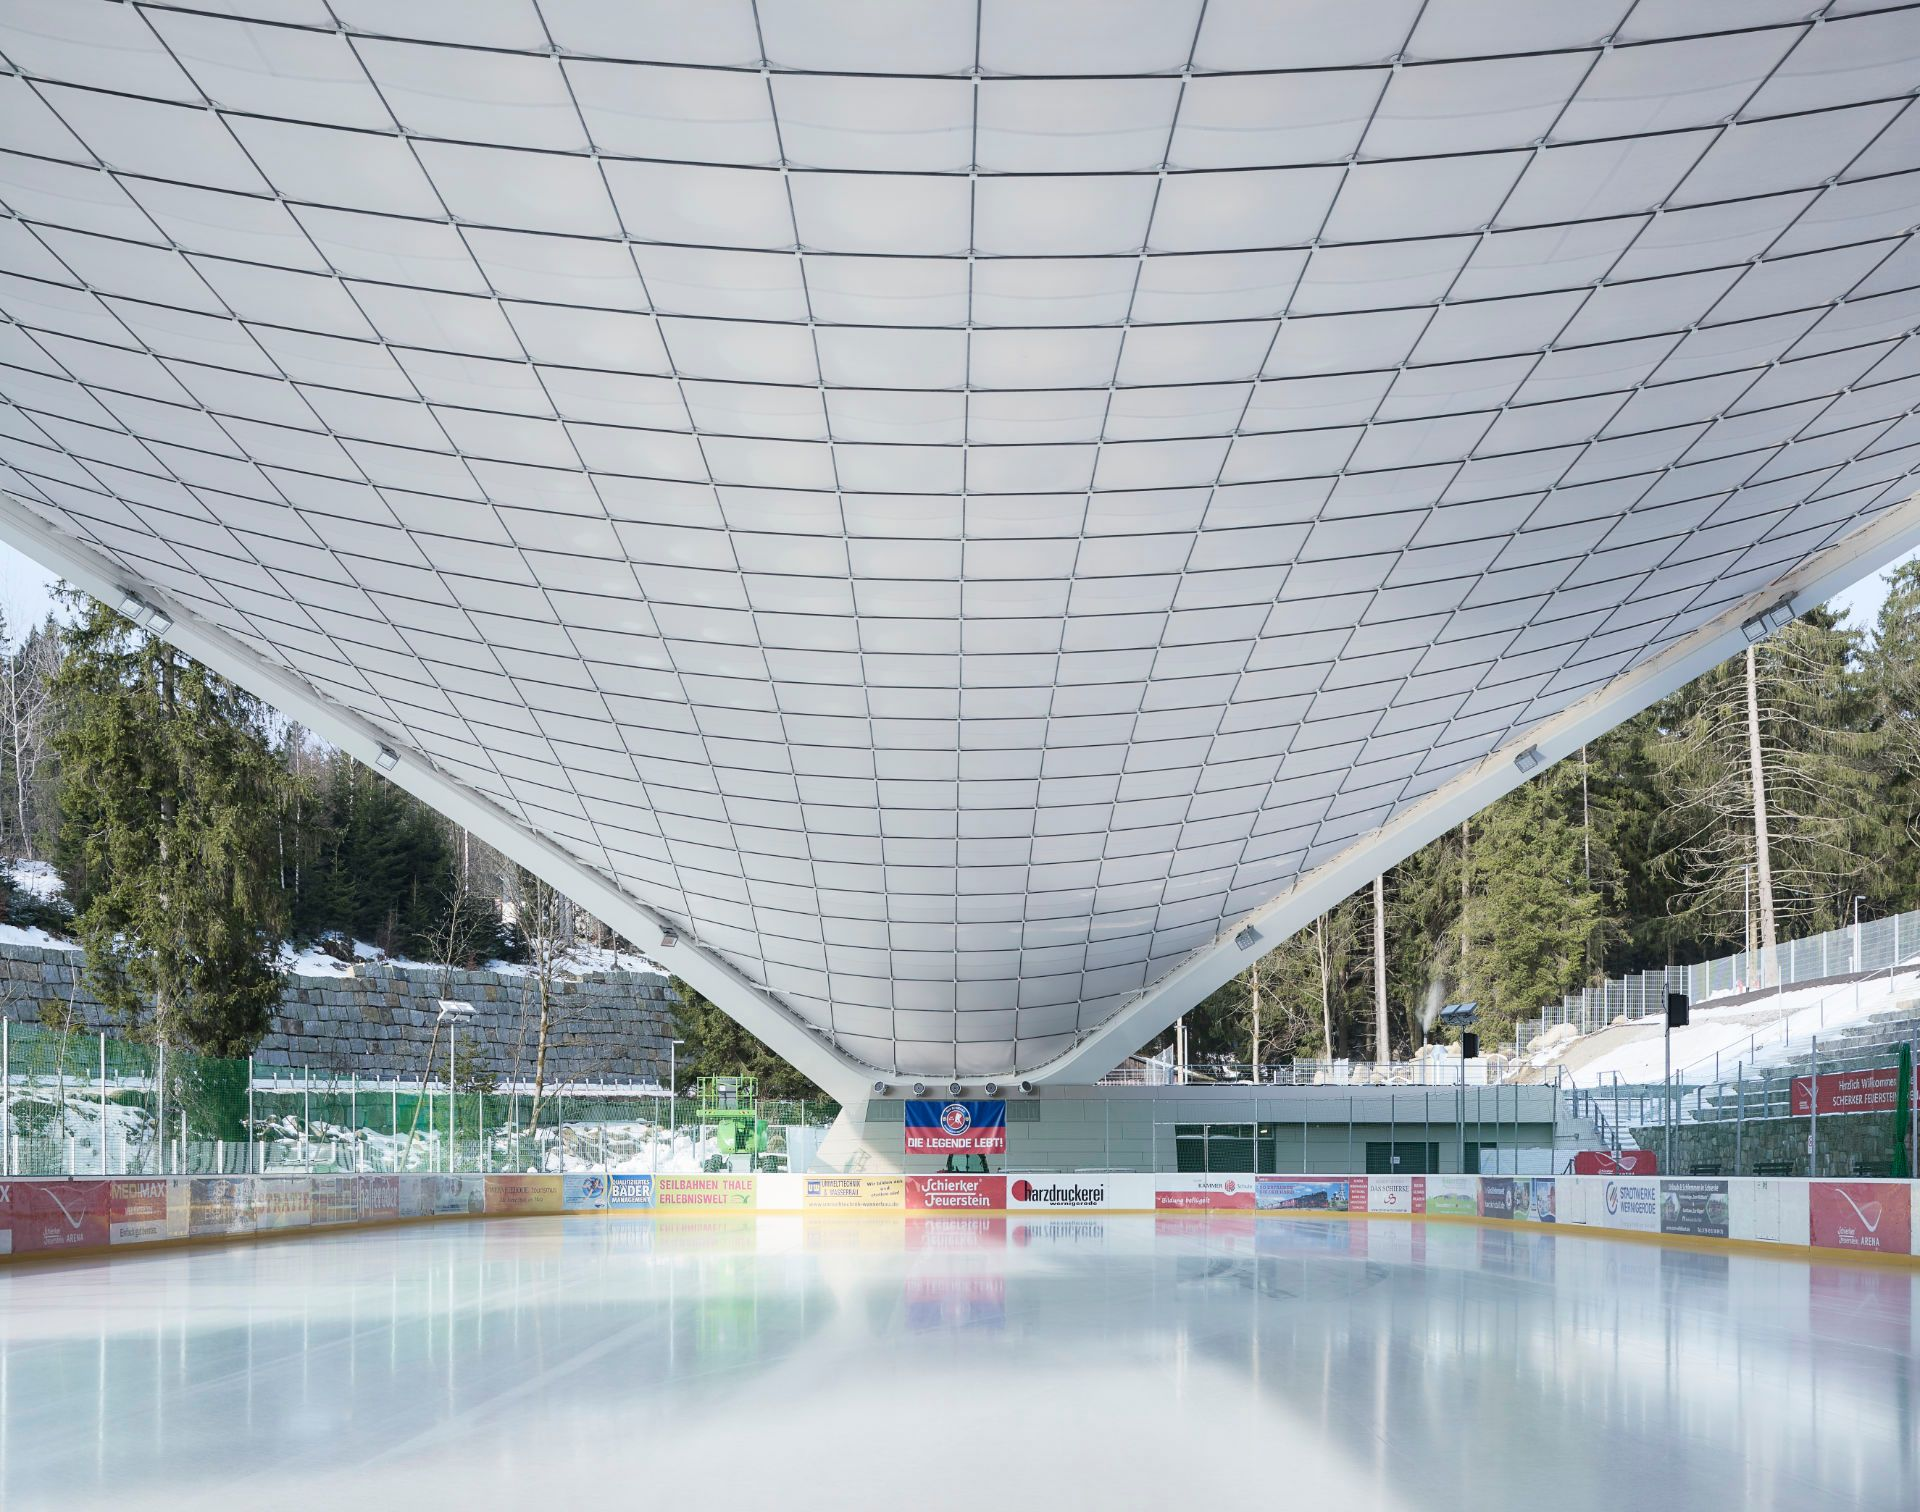 Ice Stadium Schierke